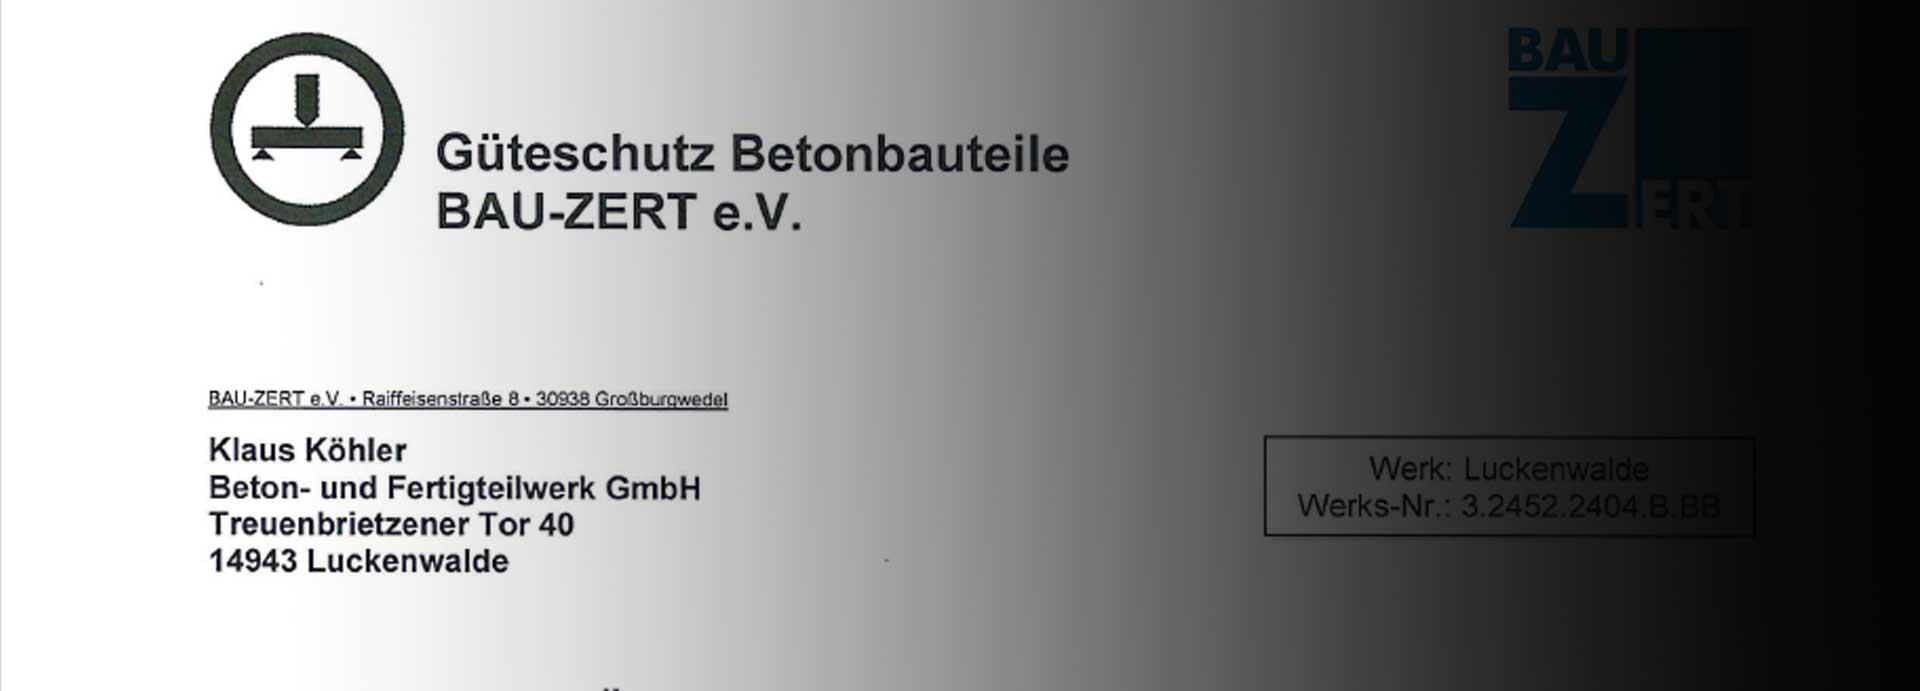 BAU-ZERT e.V Zertifizierung